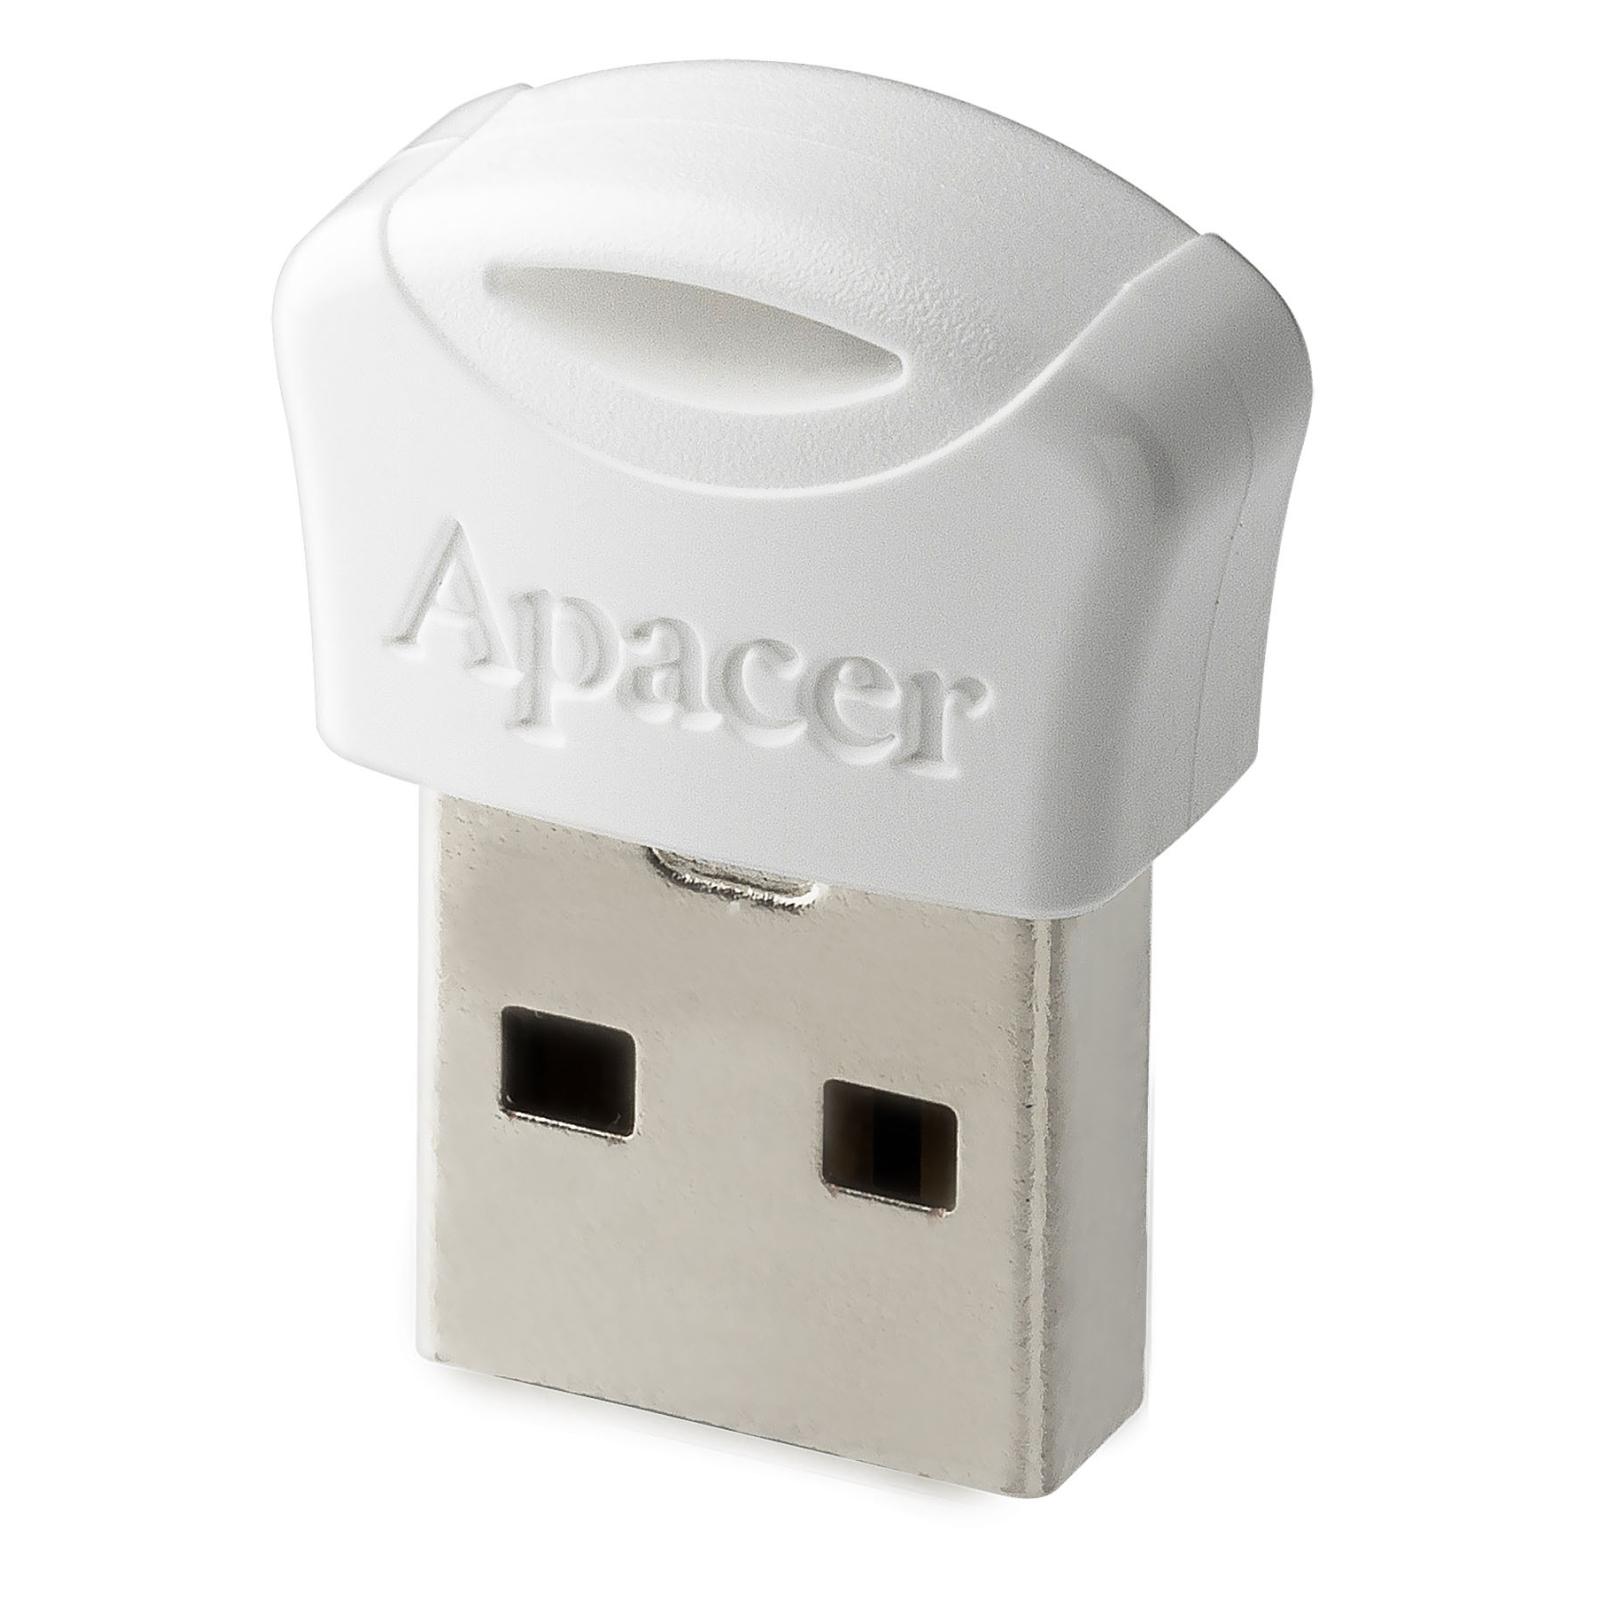 USB флеш накопитель Apacer 16GB AH116 White USB 2.0 (AP16GAH116W-1) изображение 2